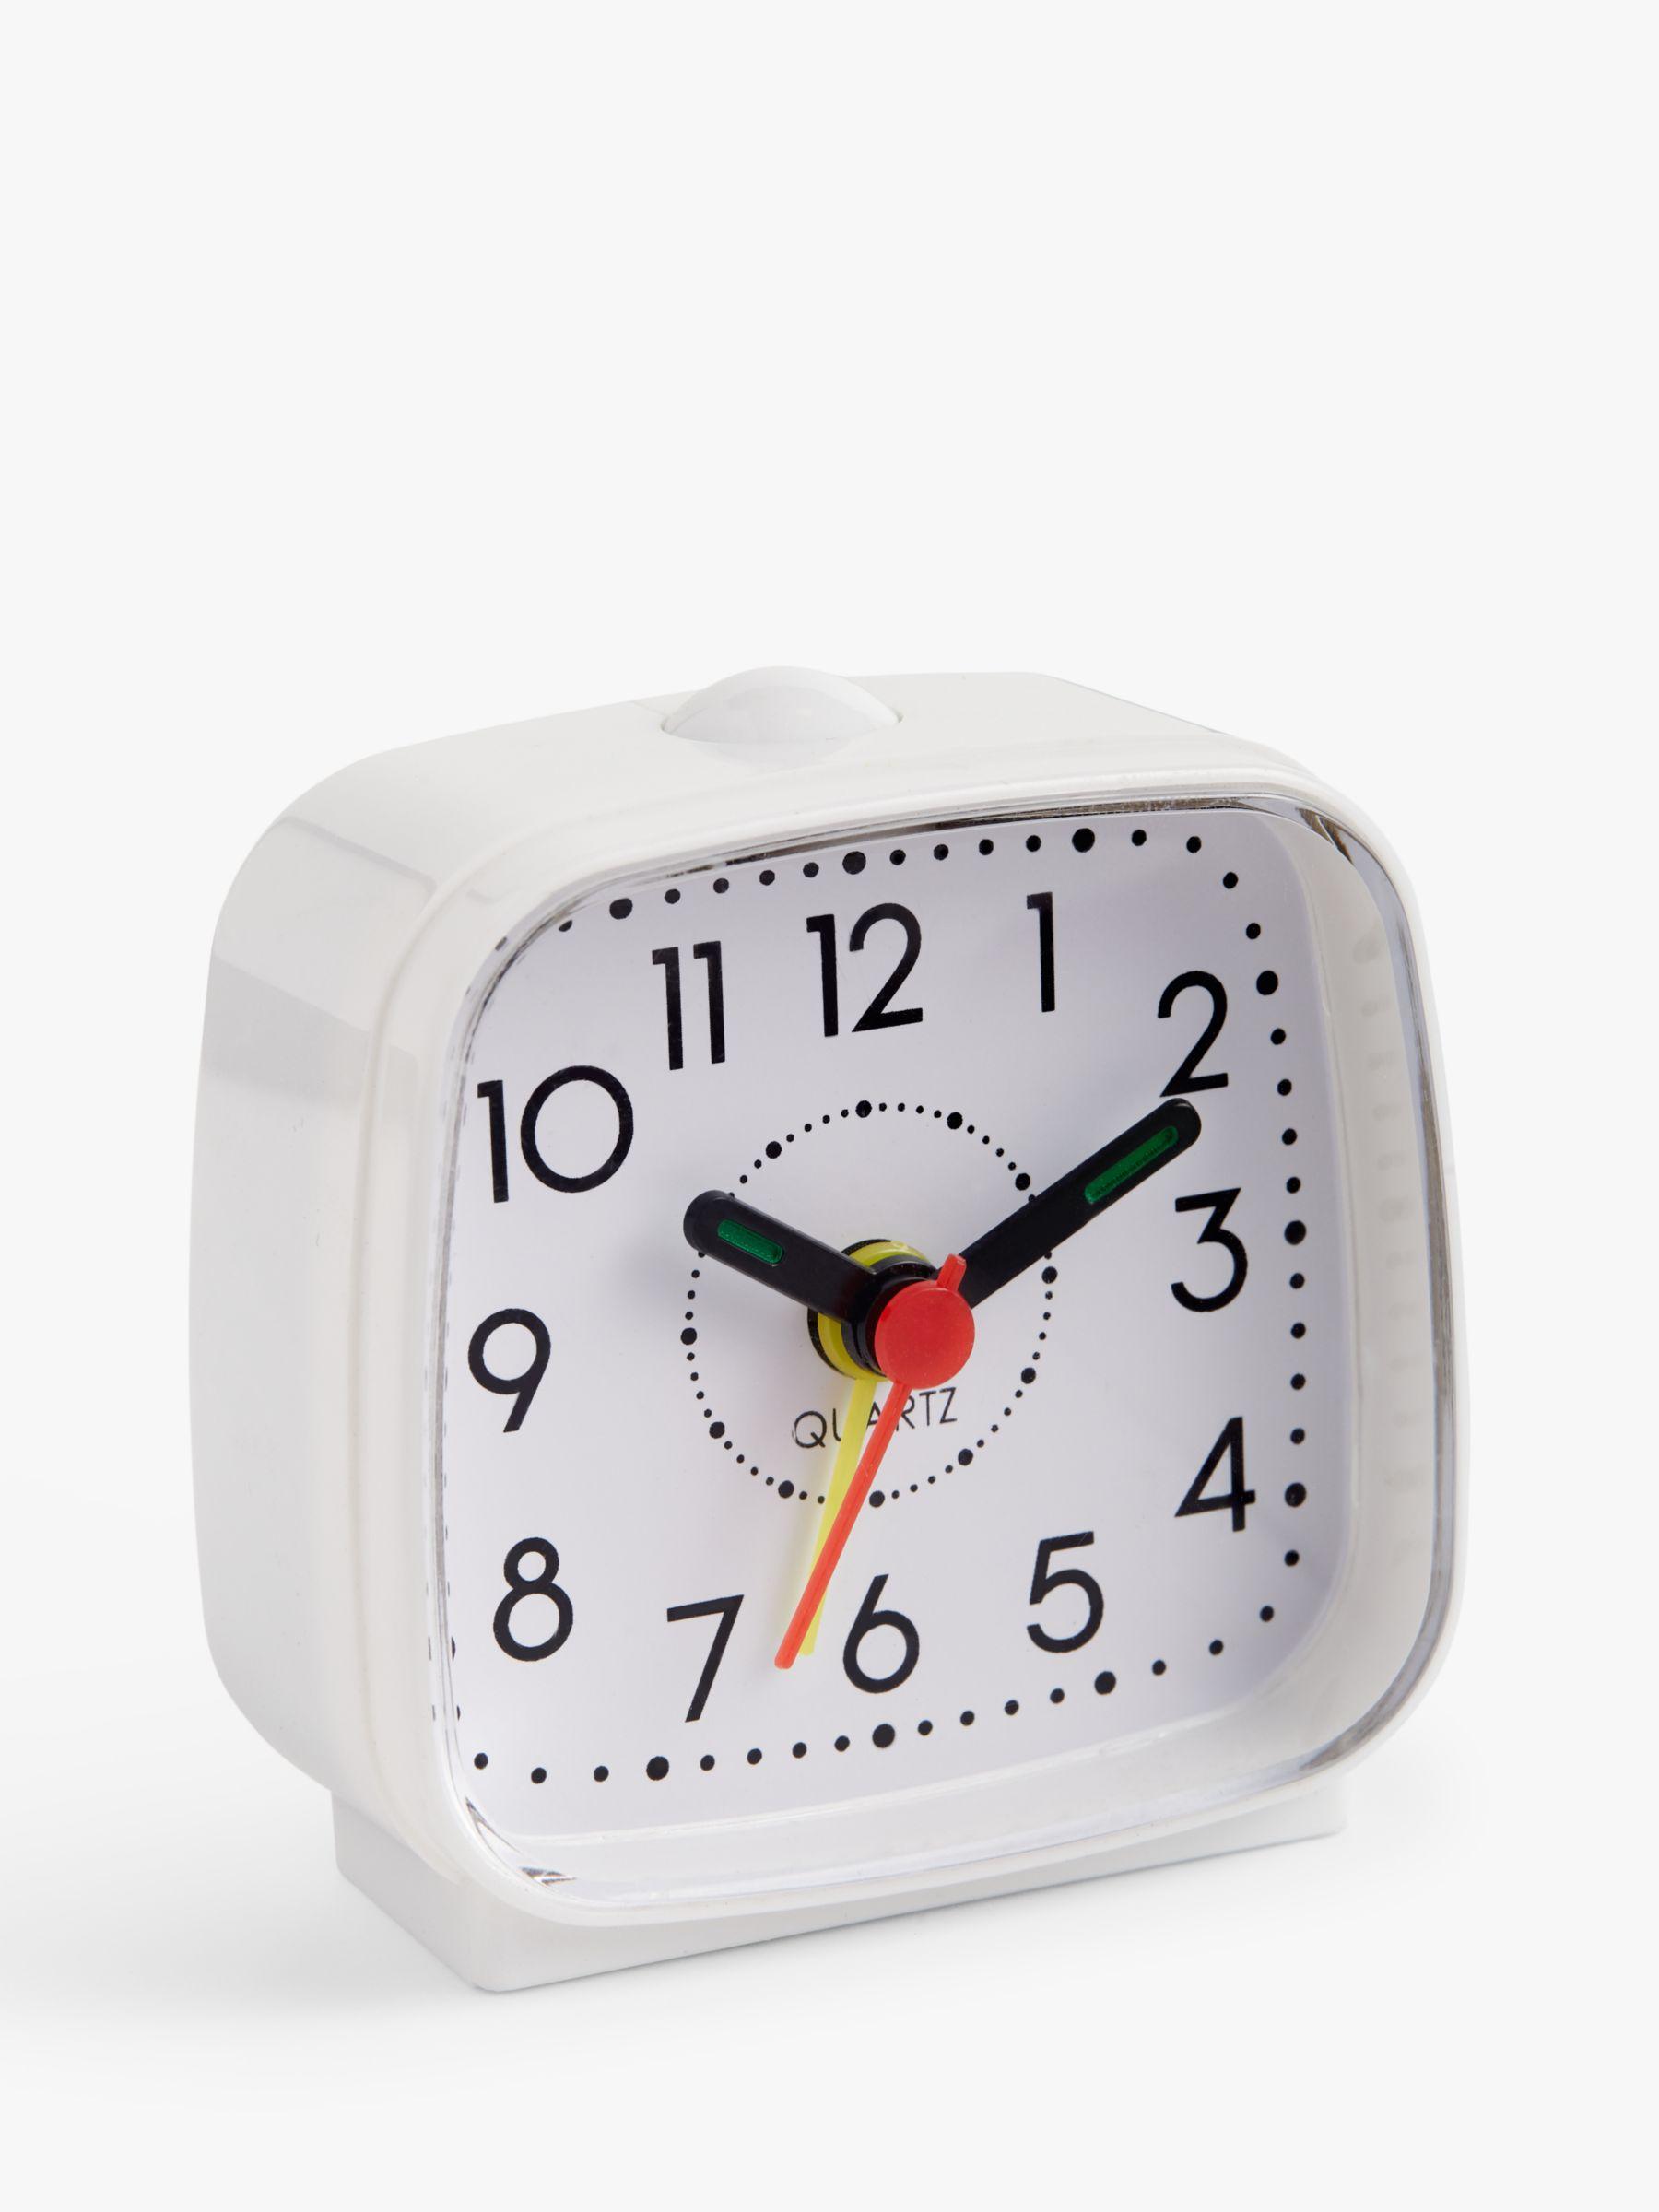 ANYDAY John Lewis & Partners Analogue Alarm Clock, White